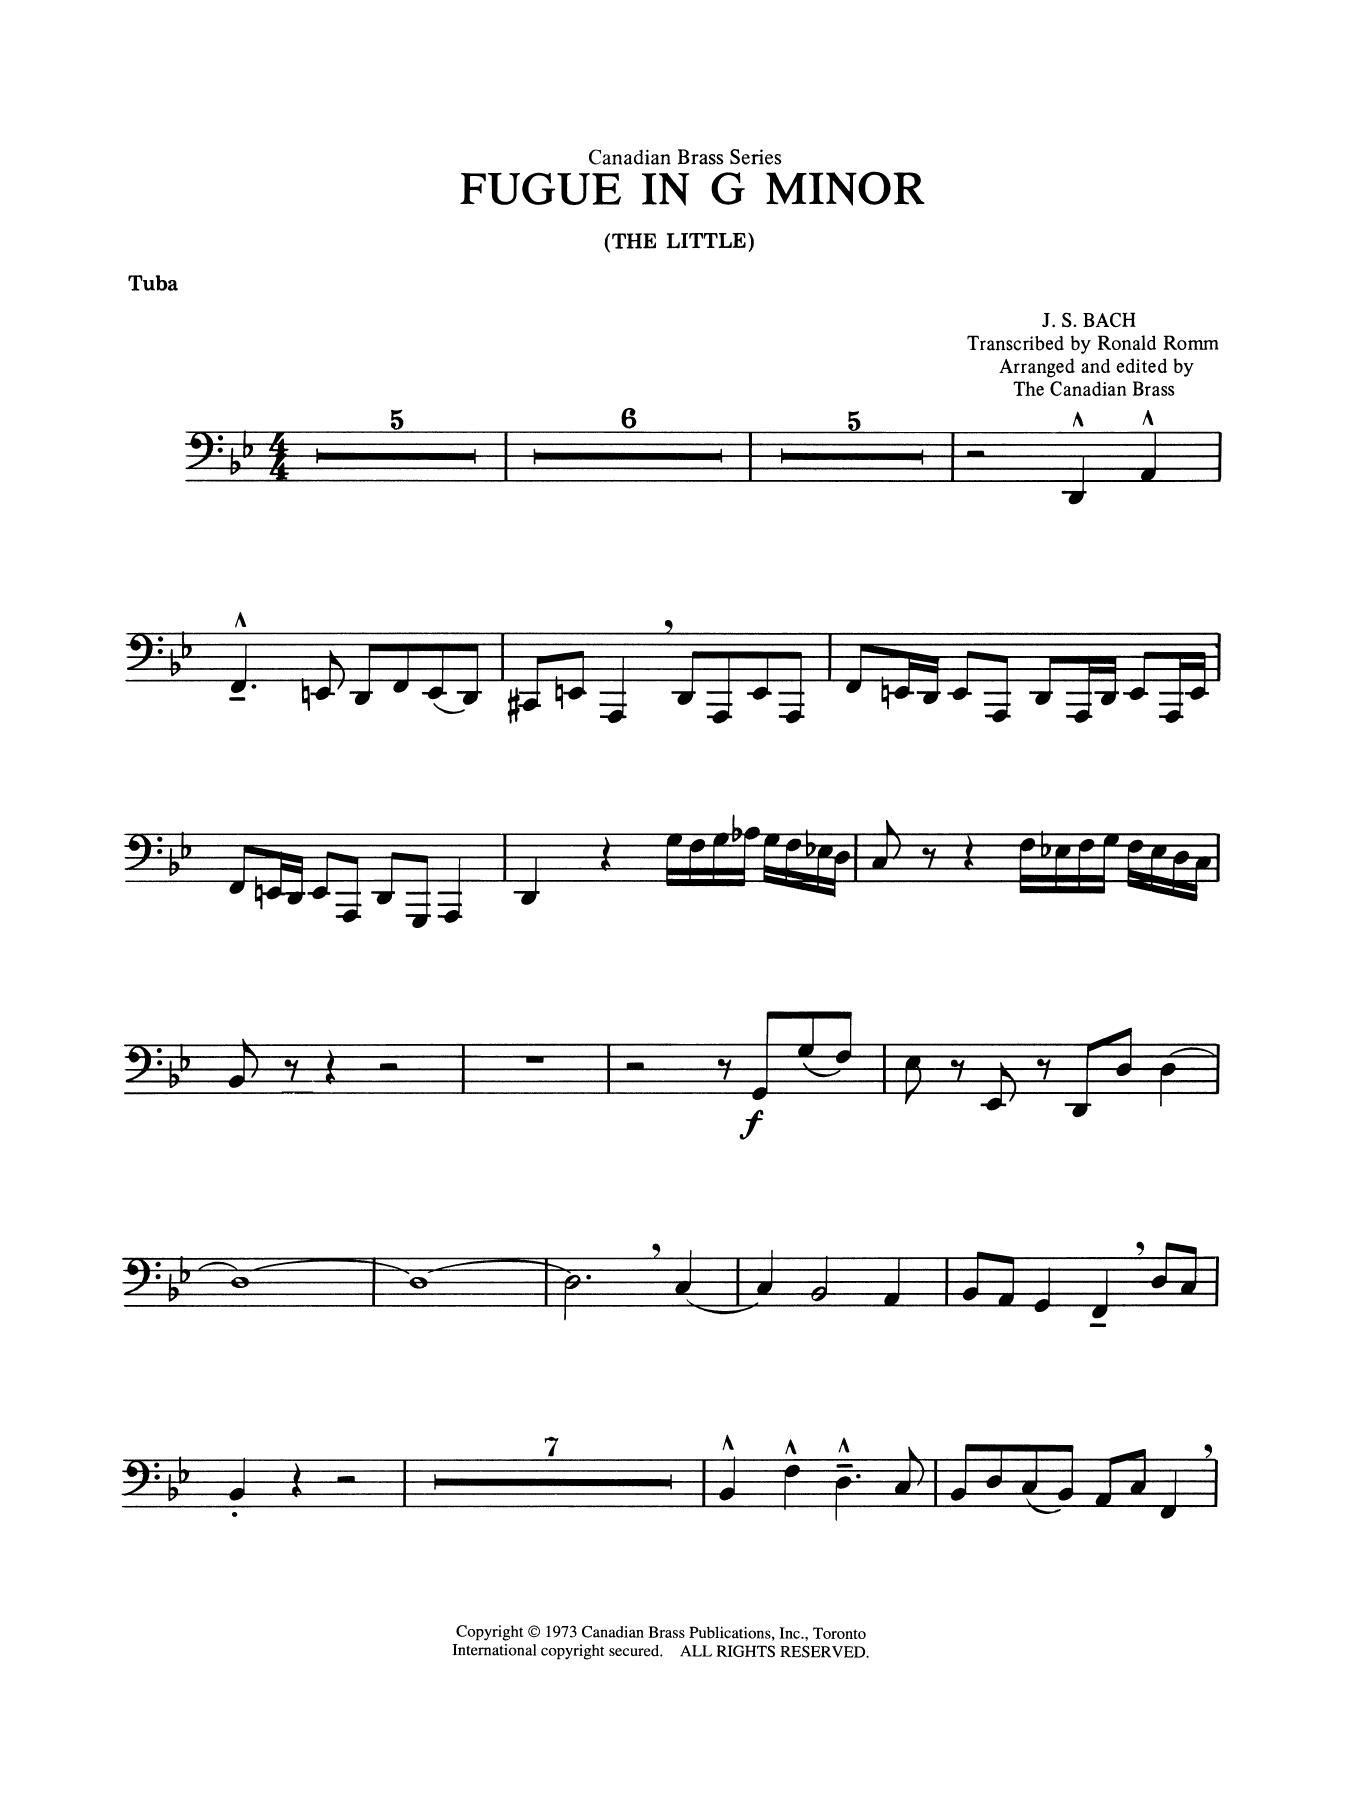 Fugue in G minor - Tuba Sheet Music